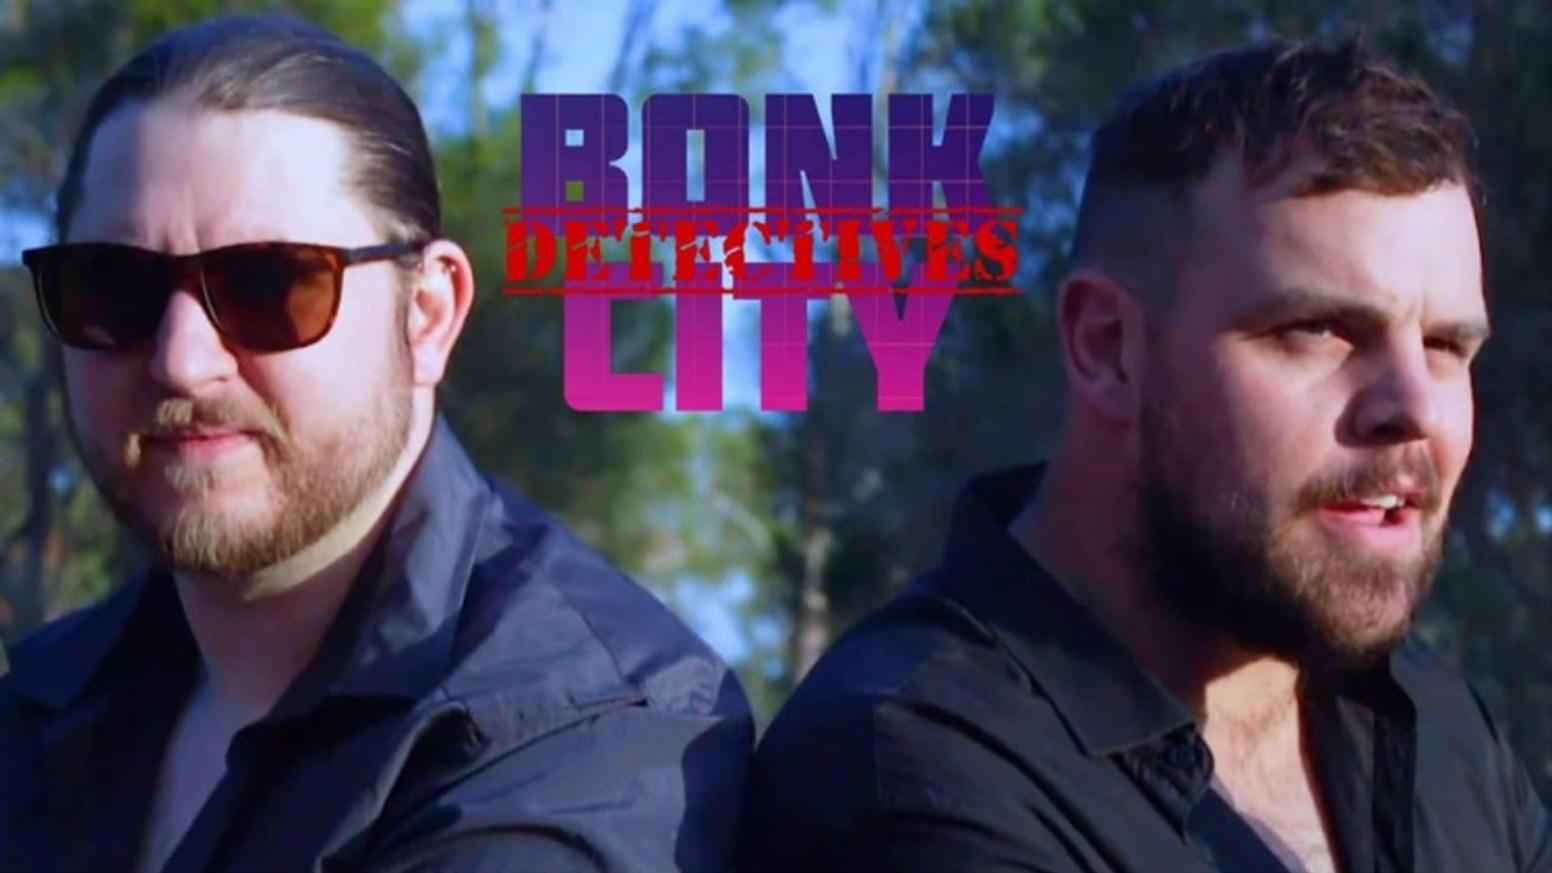 For Web Series Bonk City Detectives Cody Jones And Broden Monogue Raise Assets